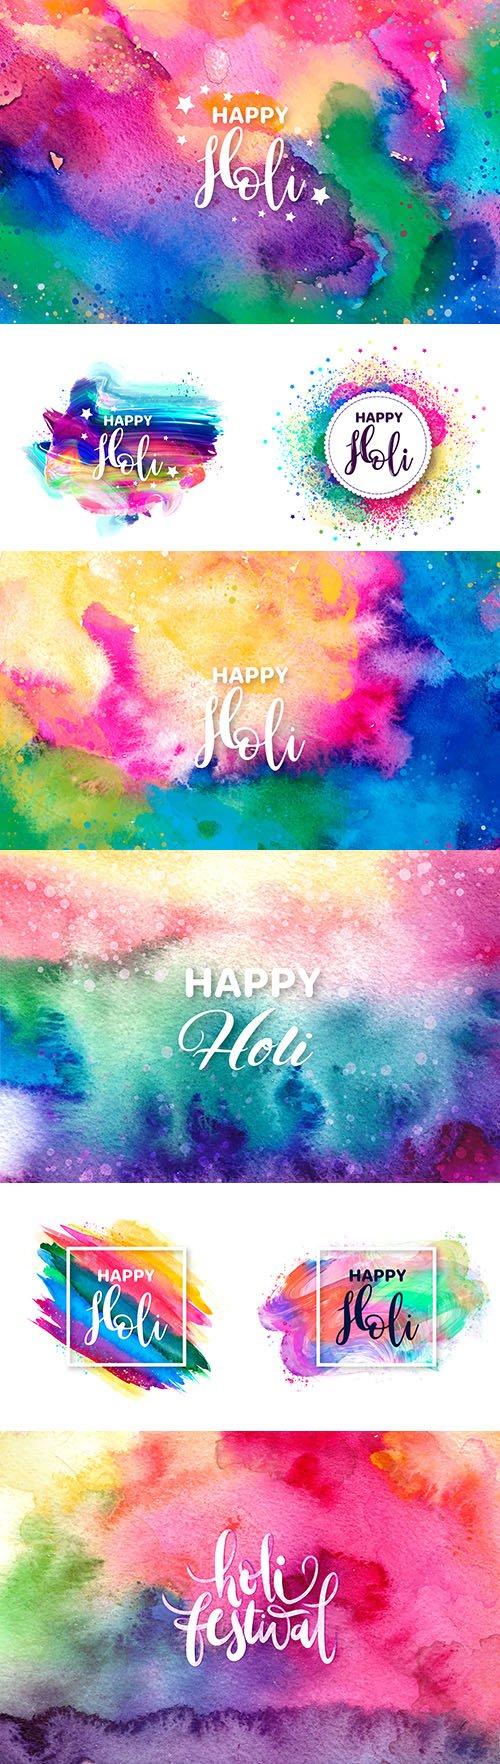 Happy Holi festival traditional watercolor illustration